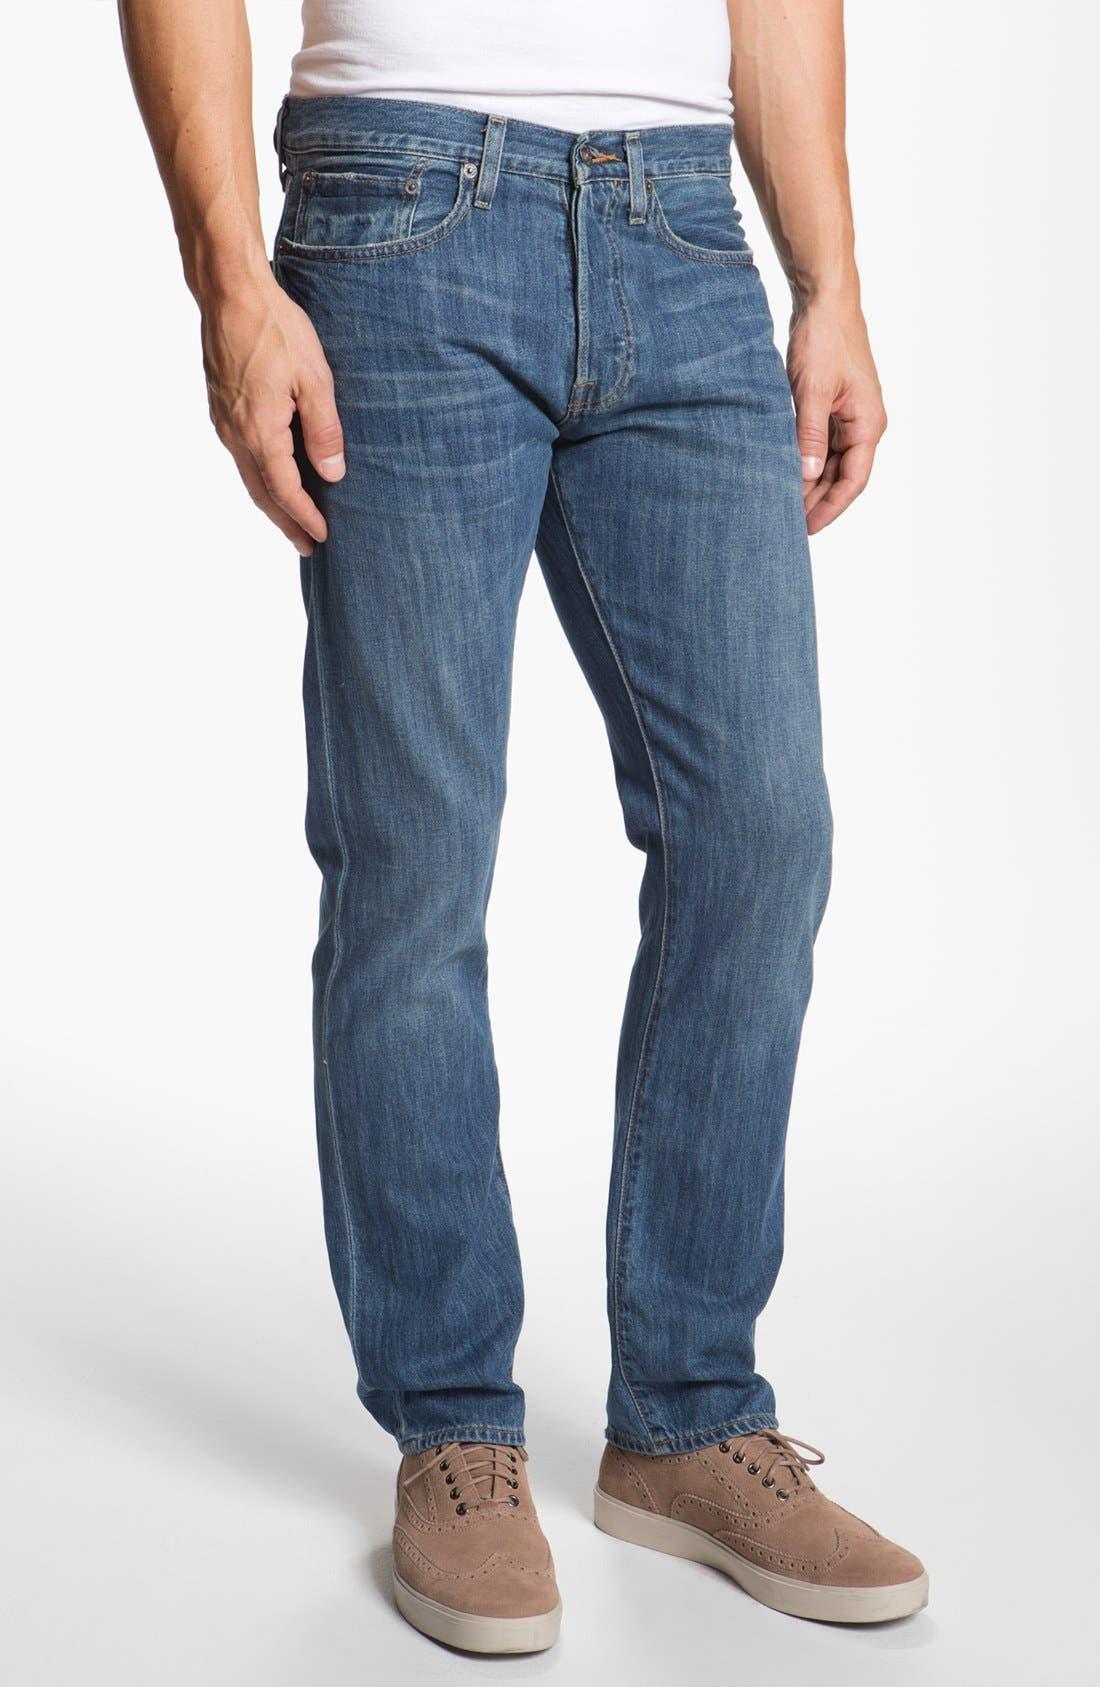 Alternate Image 1 Selected - Lucky Brand '121 Heritage' Slim Straight Leg Jeans (Conejo)